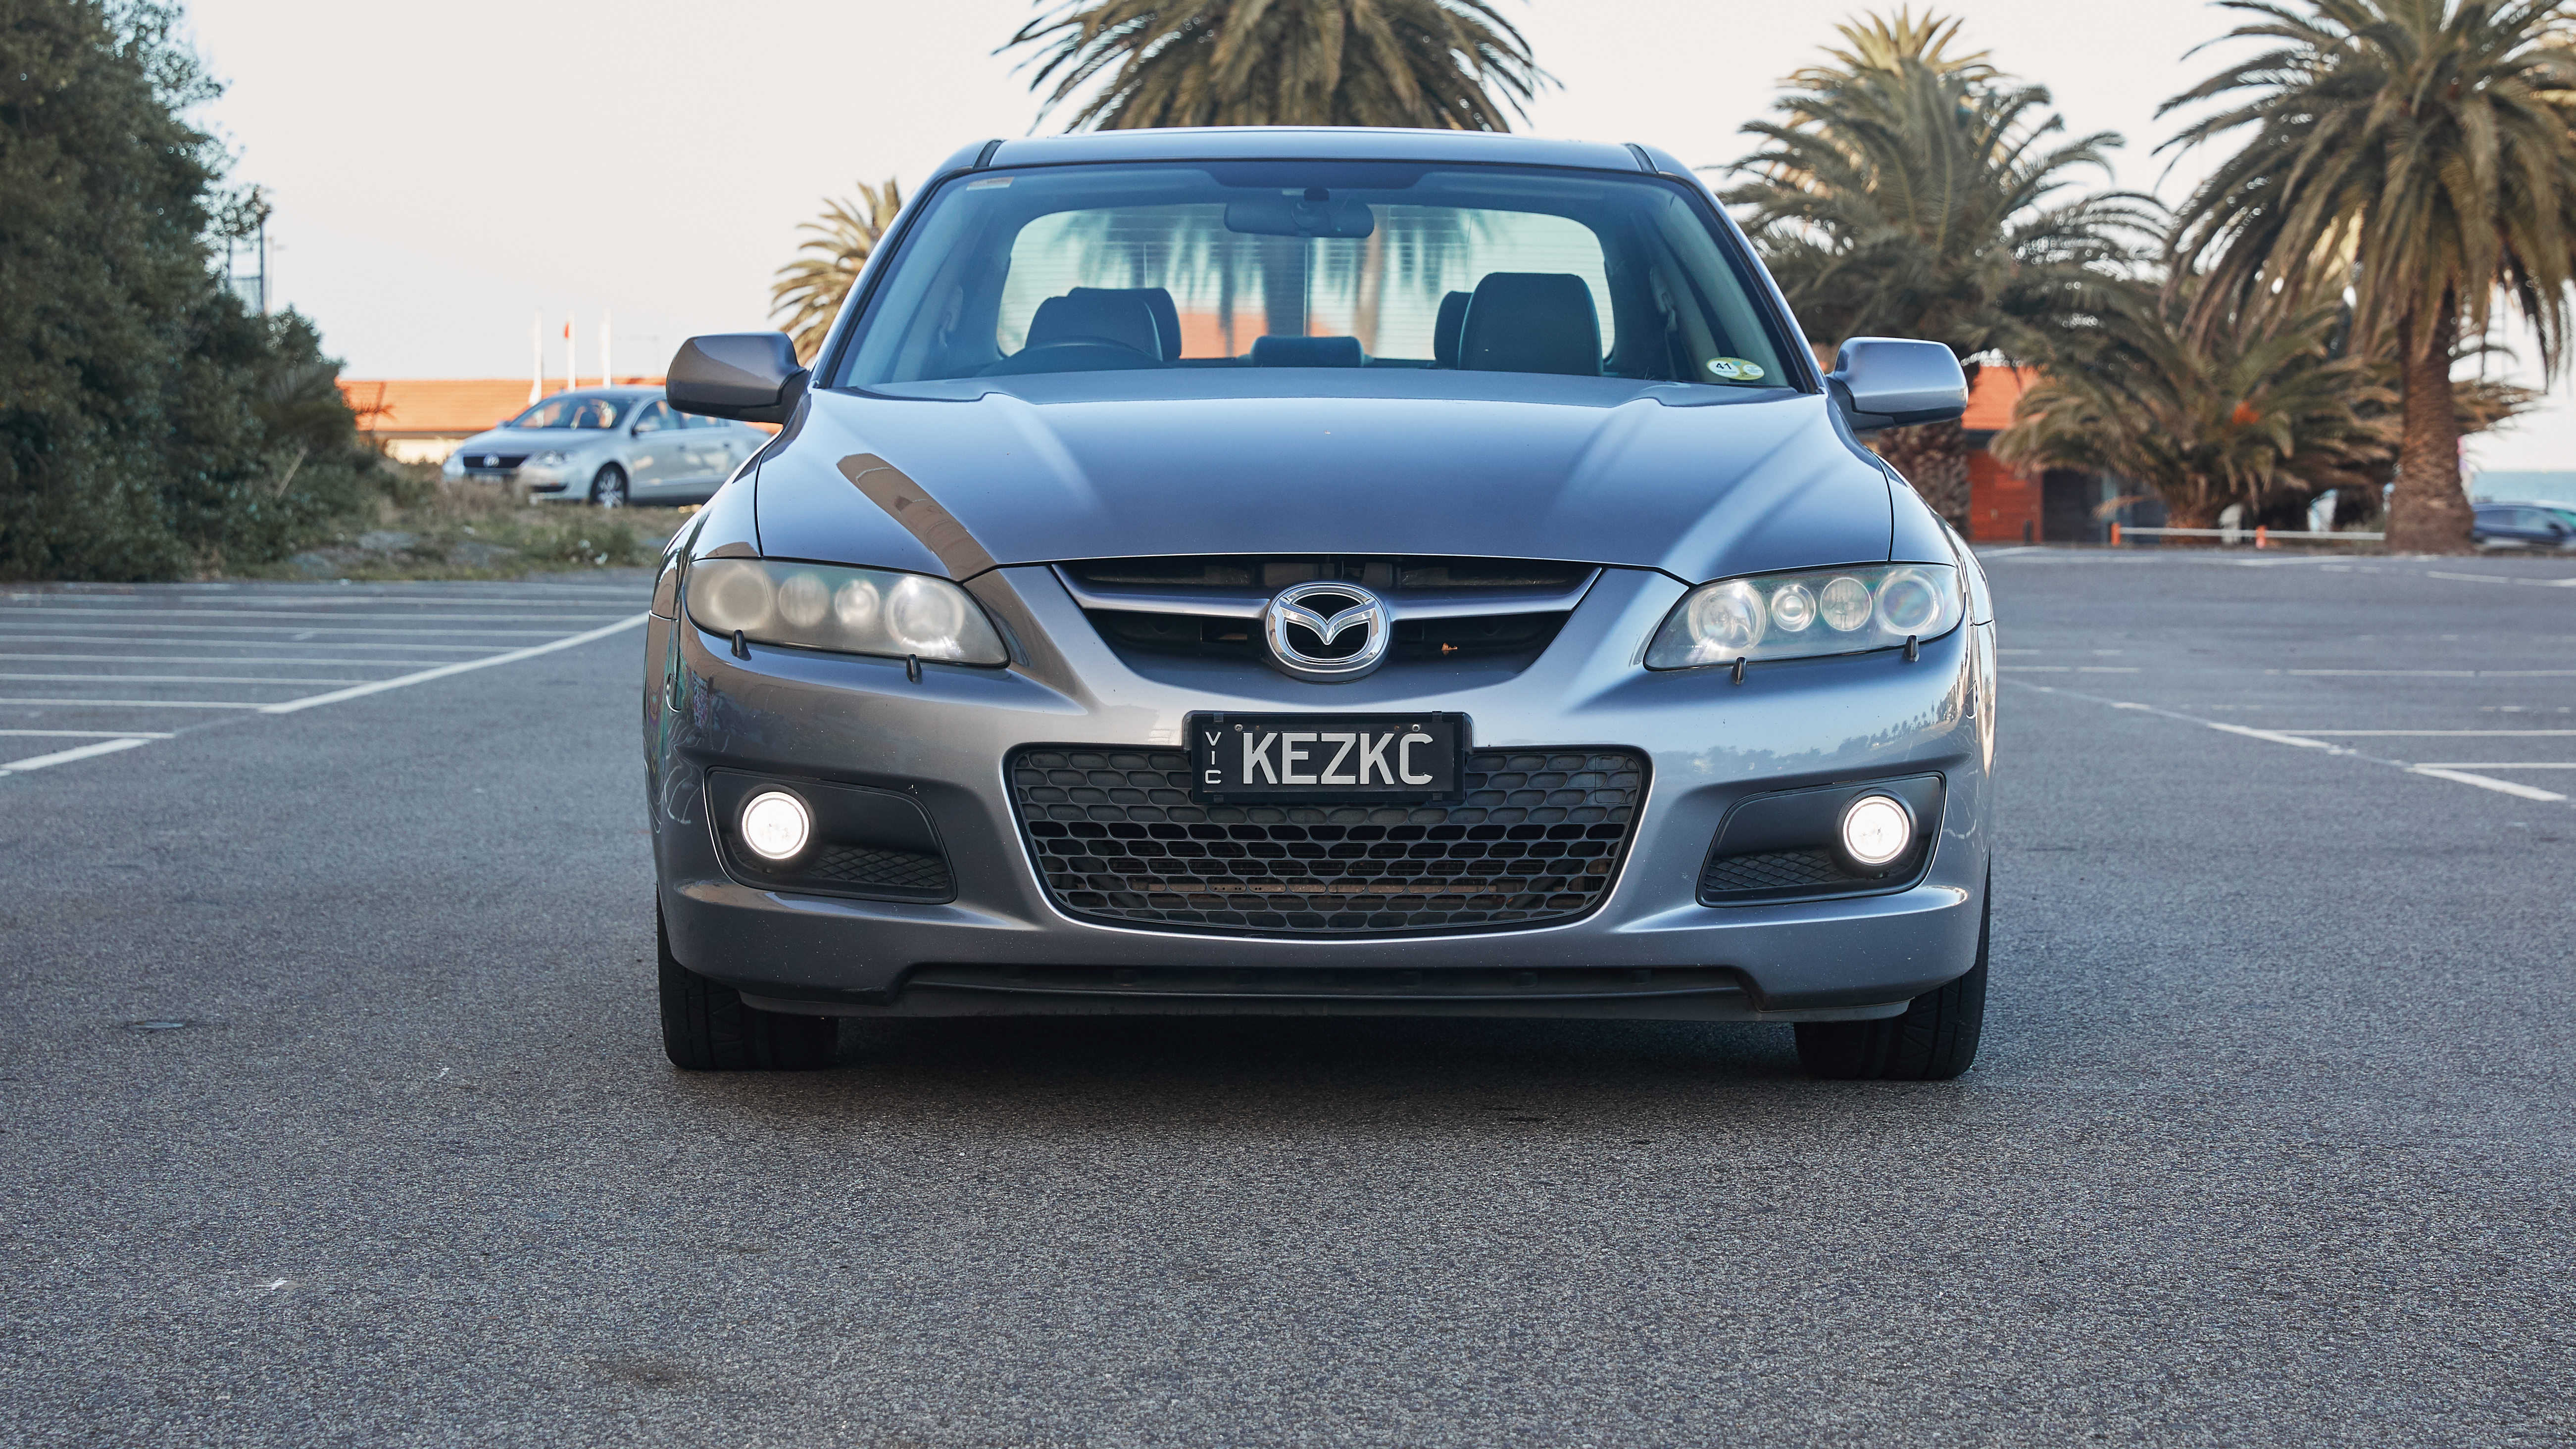 2018 Mazda 6 Atenza turbo v 2005 Mazda 6 MPS comparison | CarAdvice